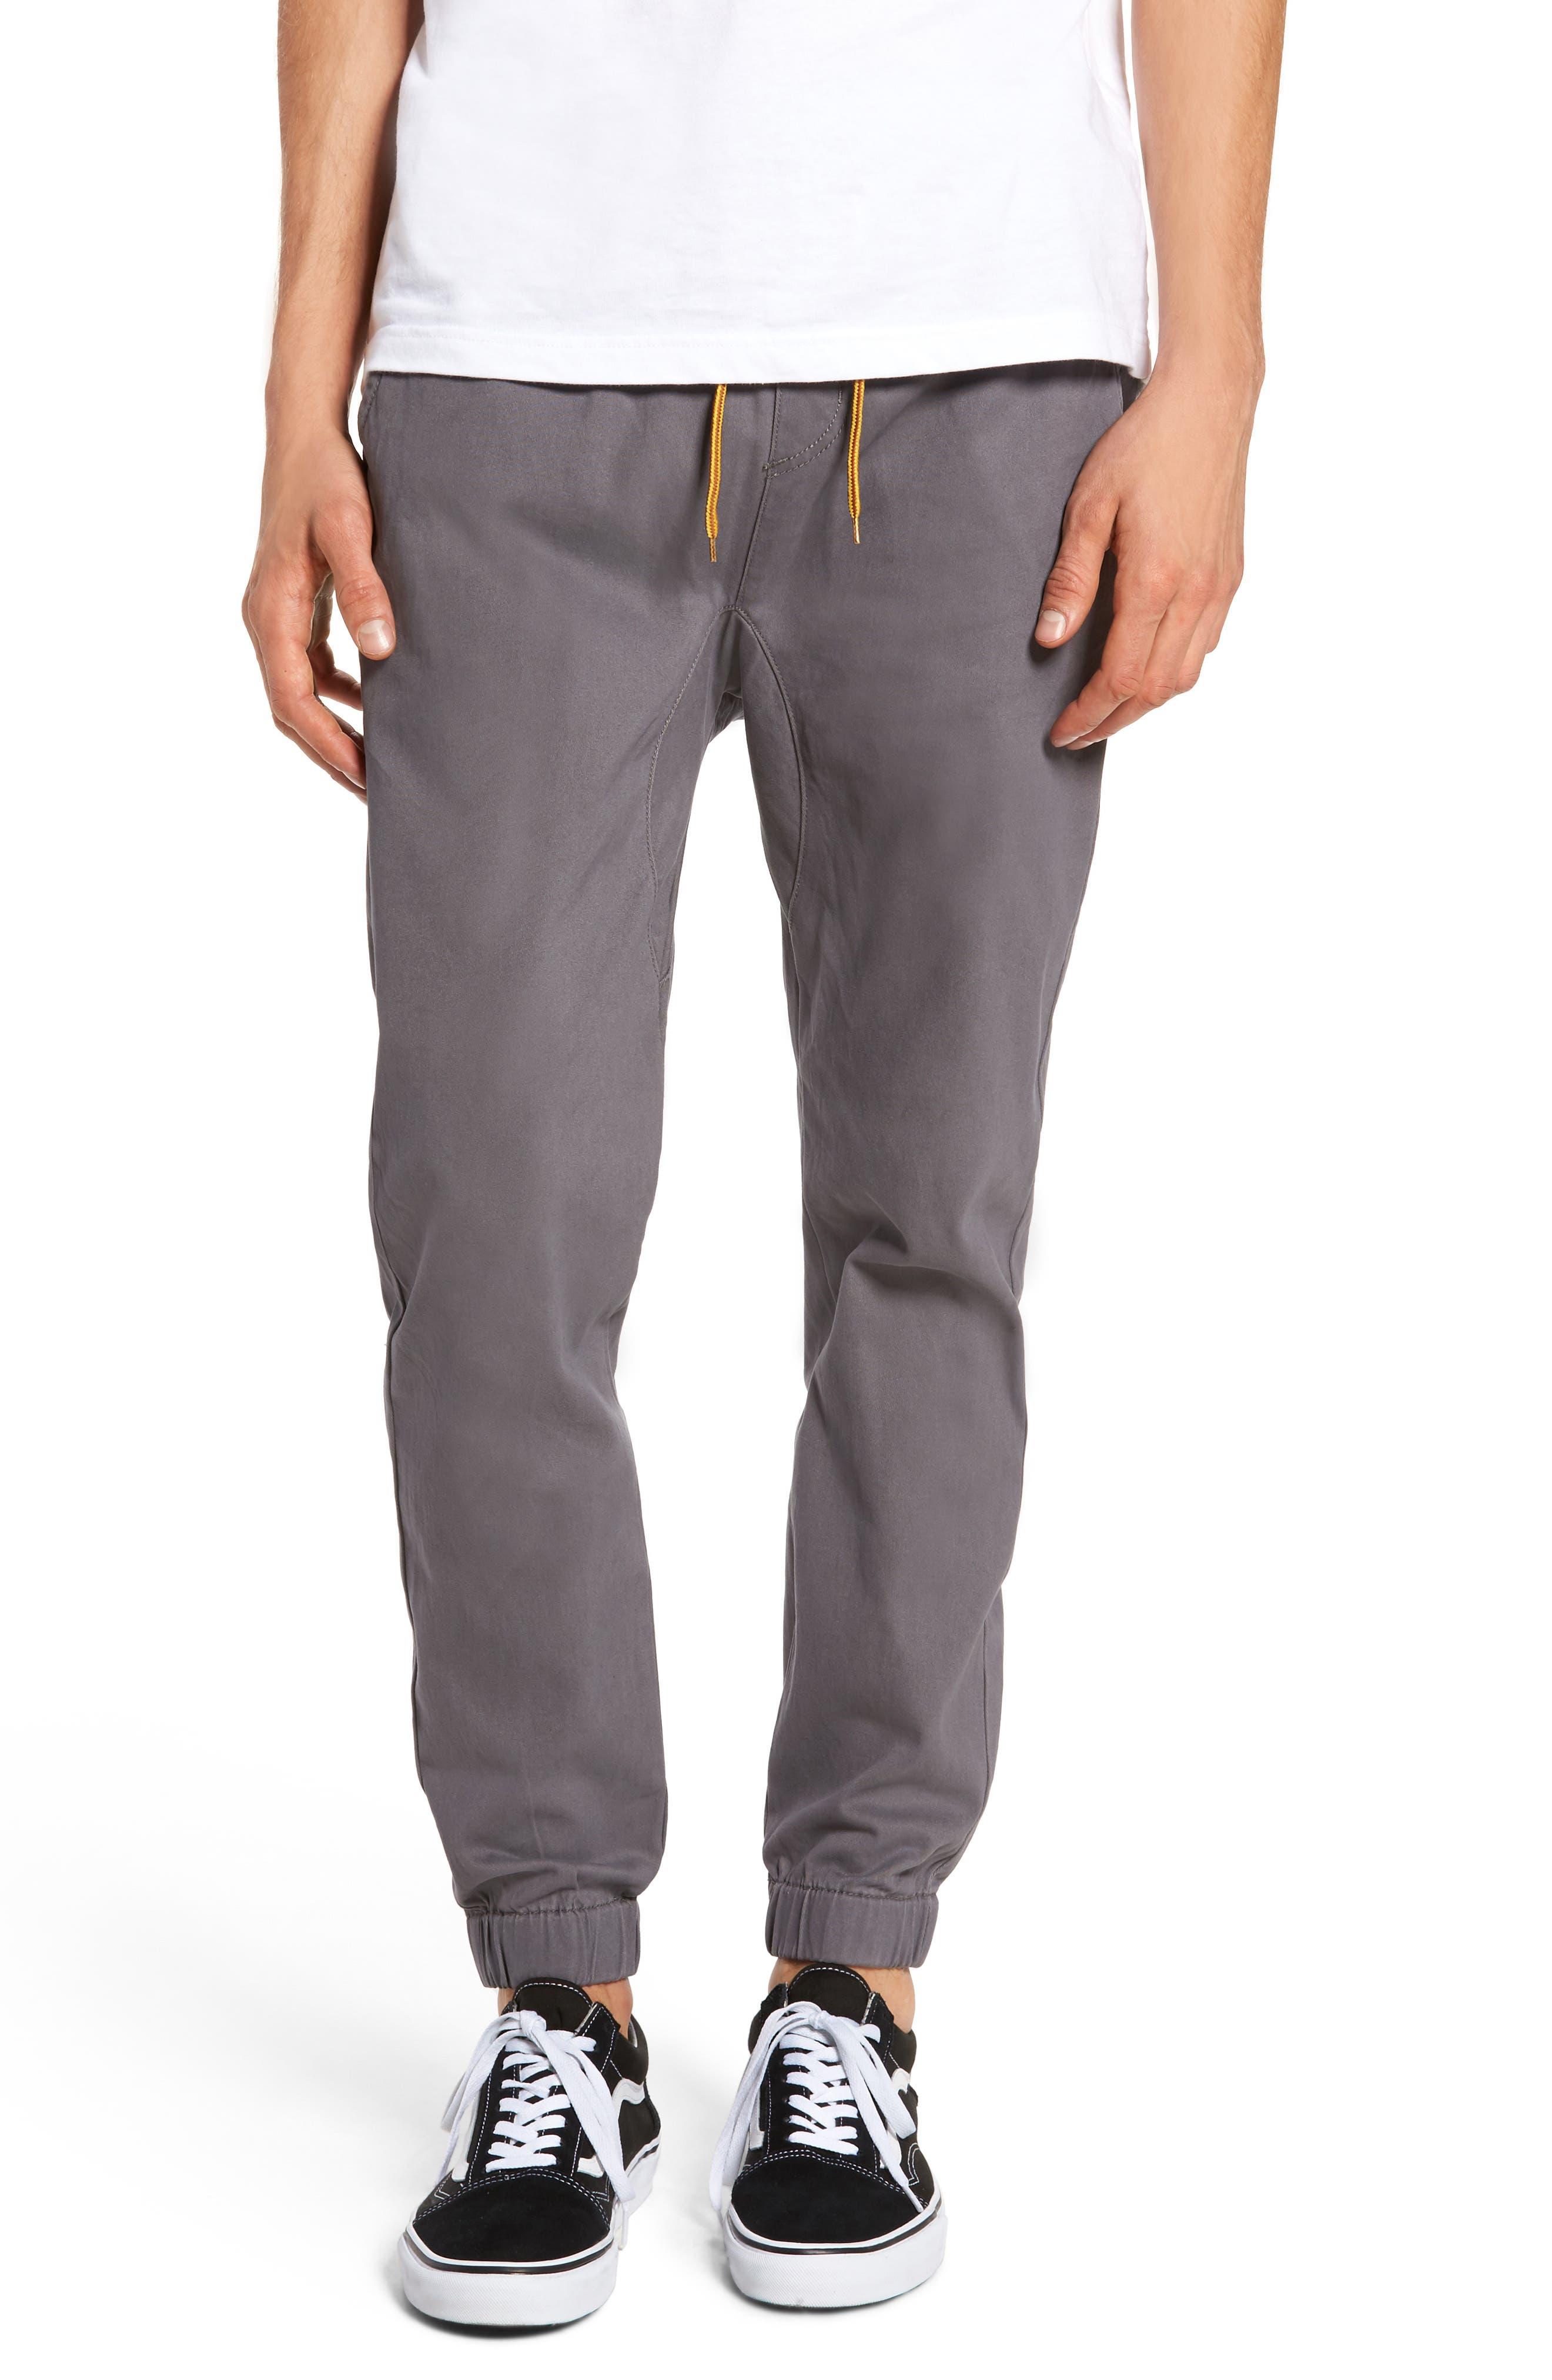 Lira Clothing Weekend Jogger Pants